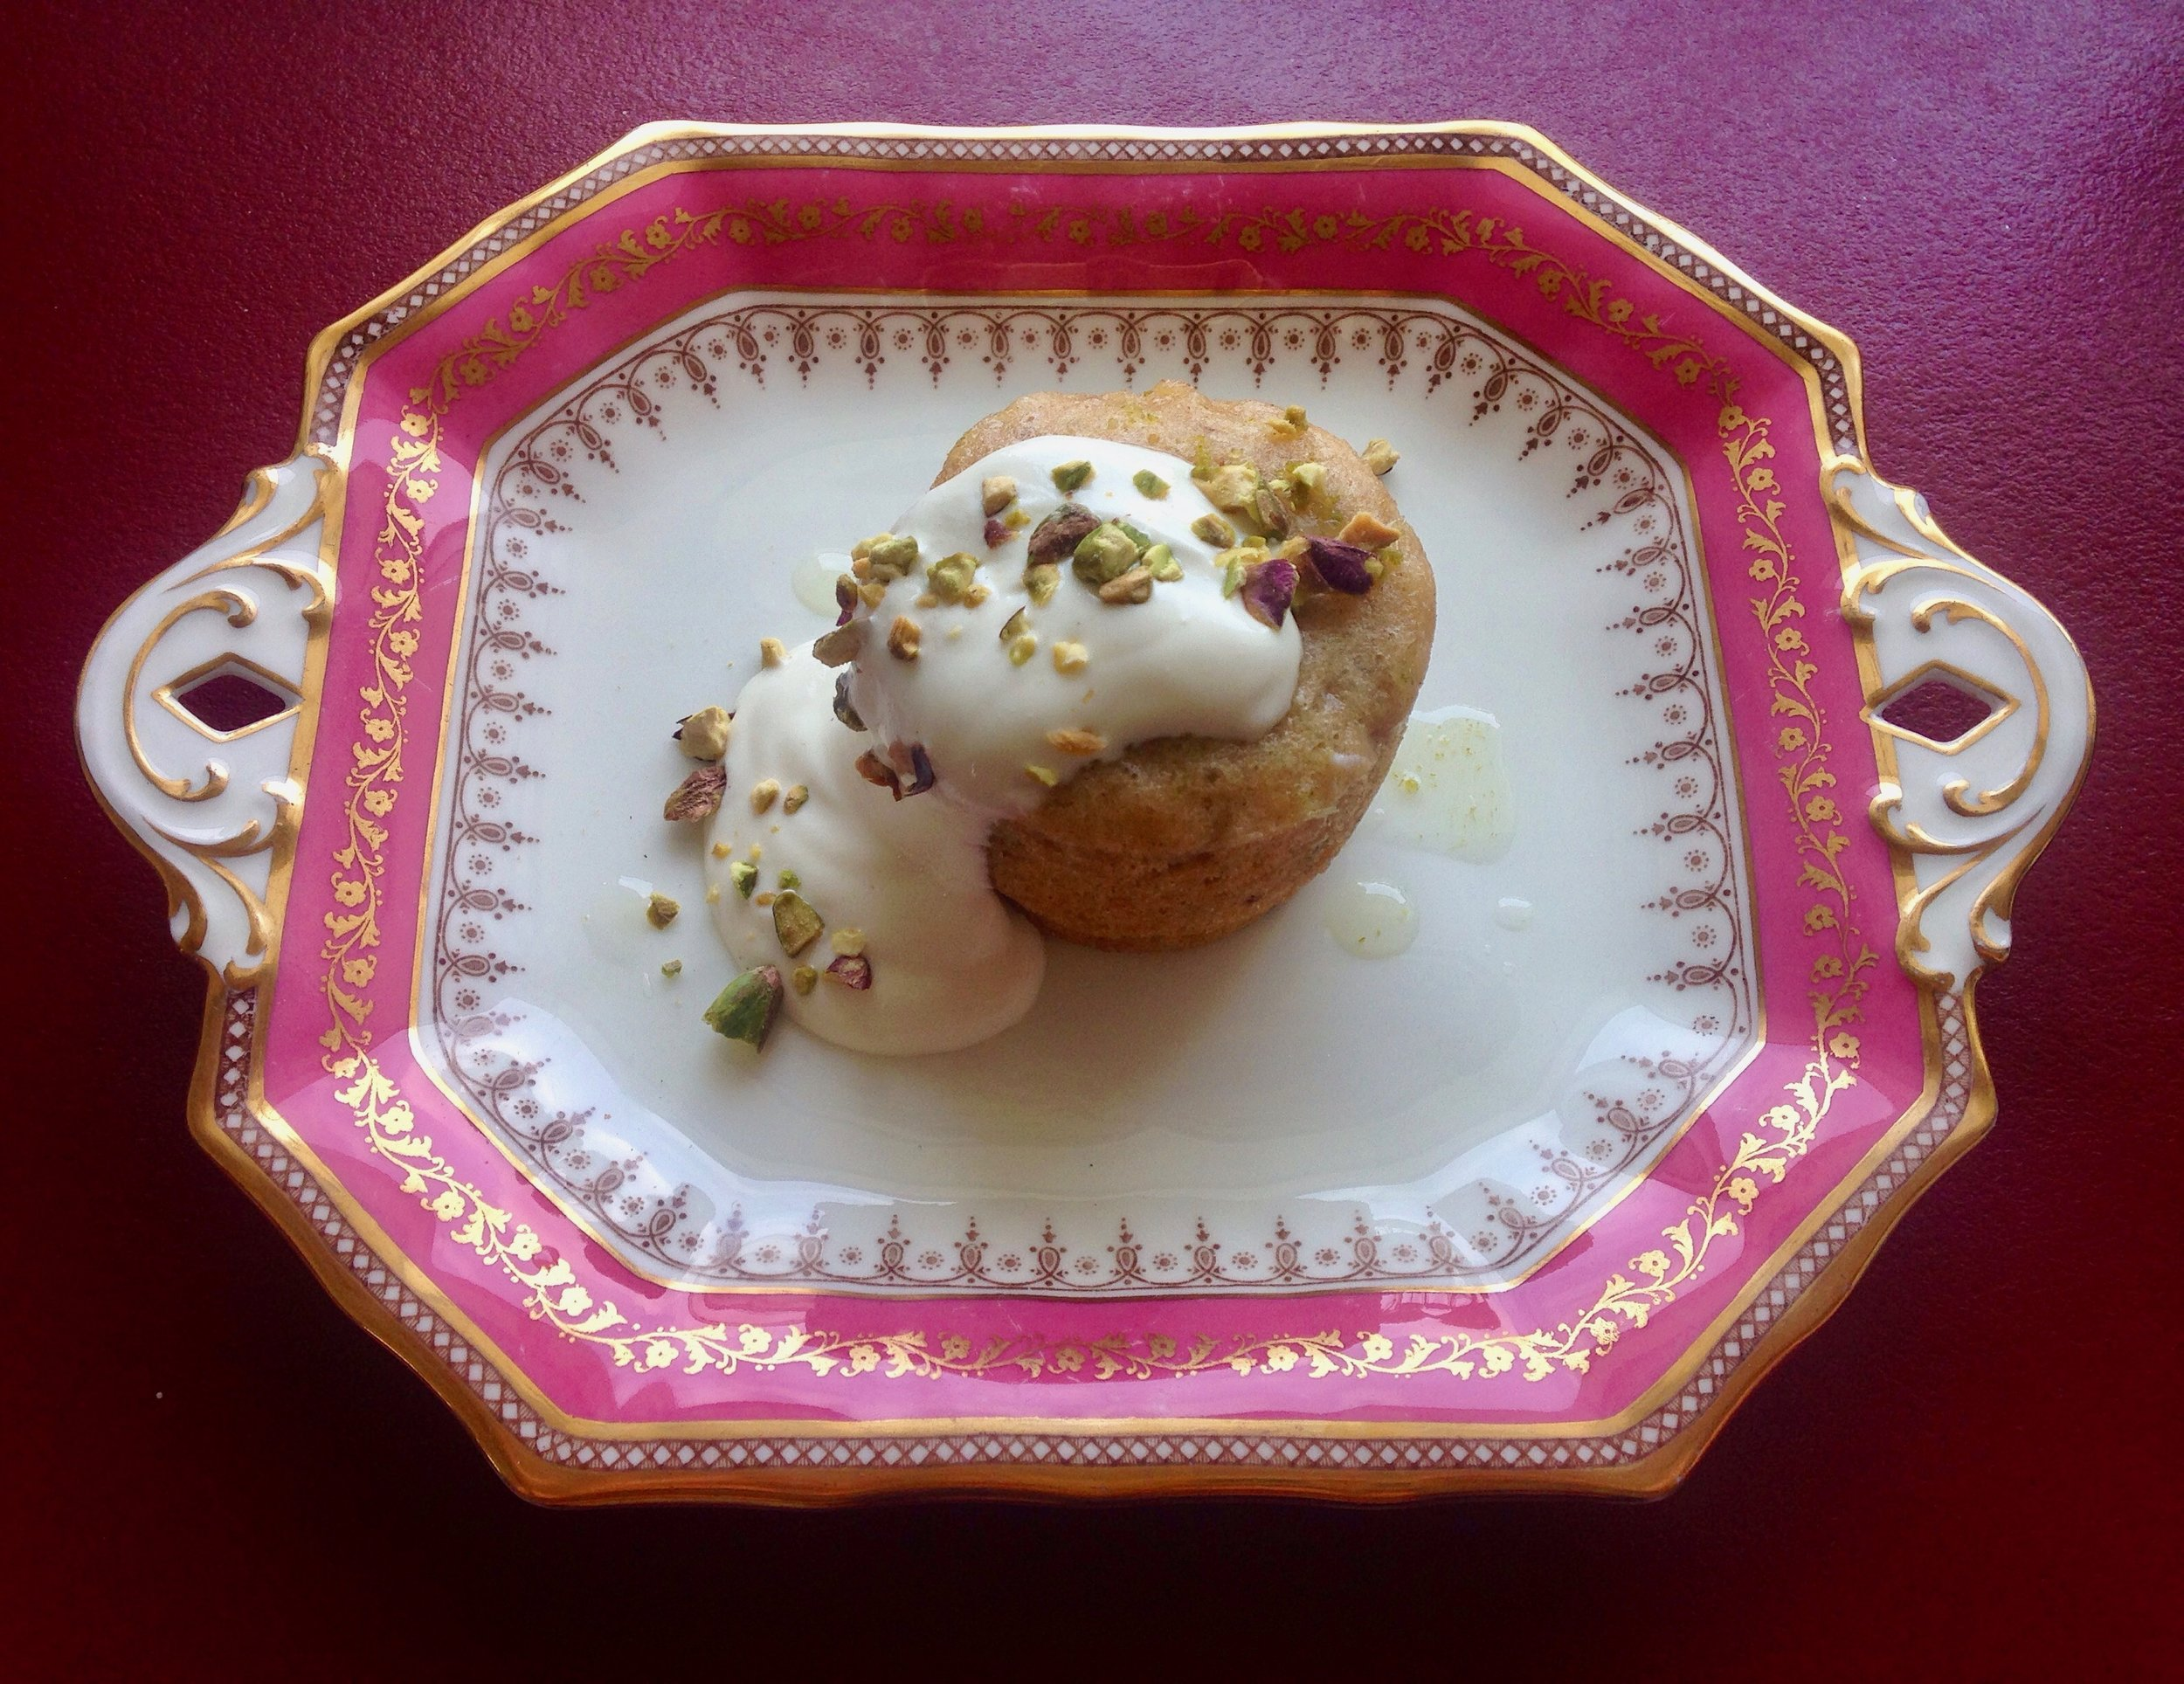 Steamed Pistachio | Banana Cake